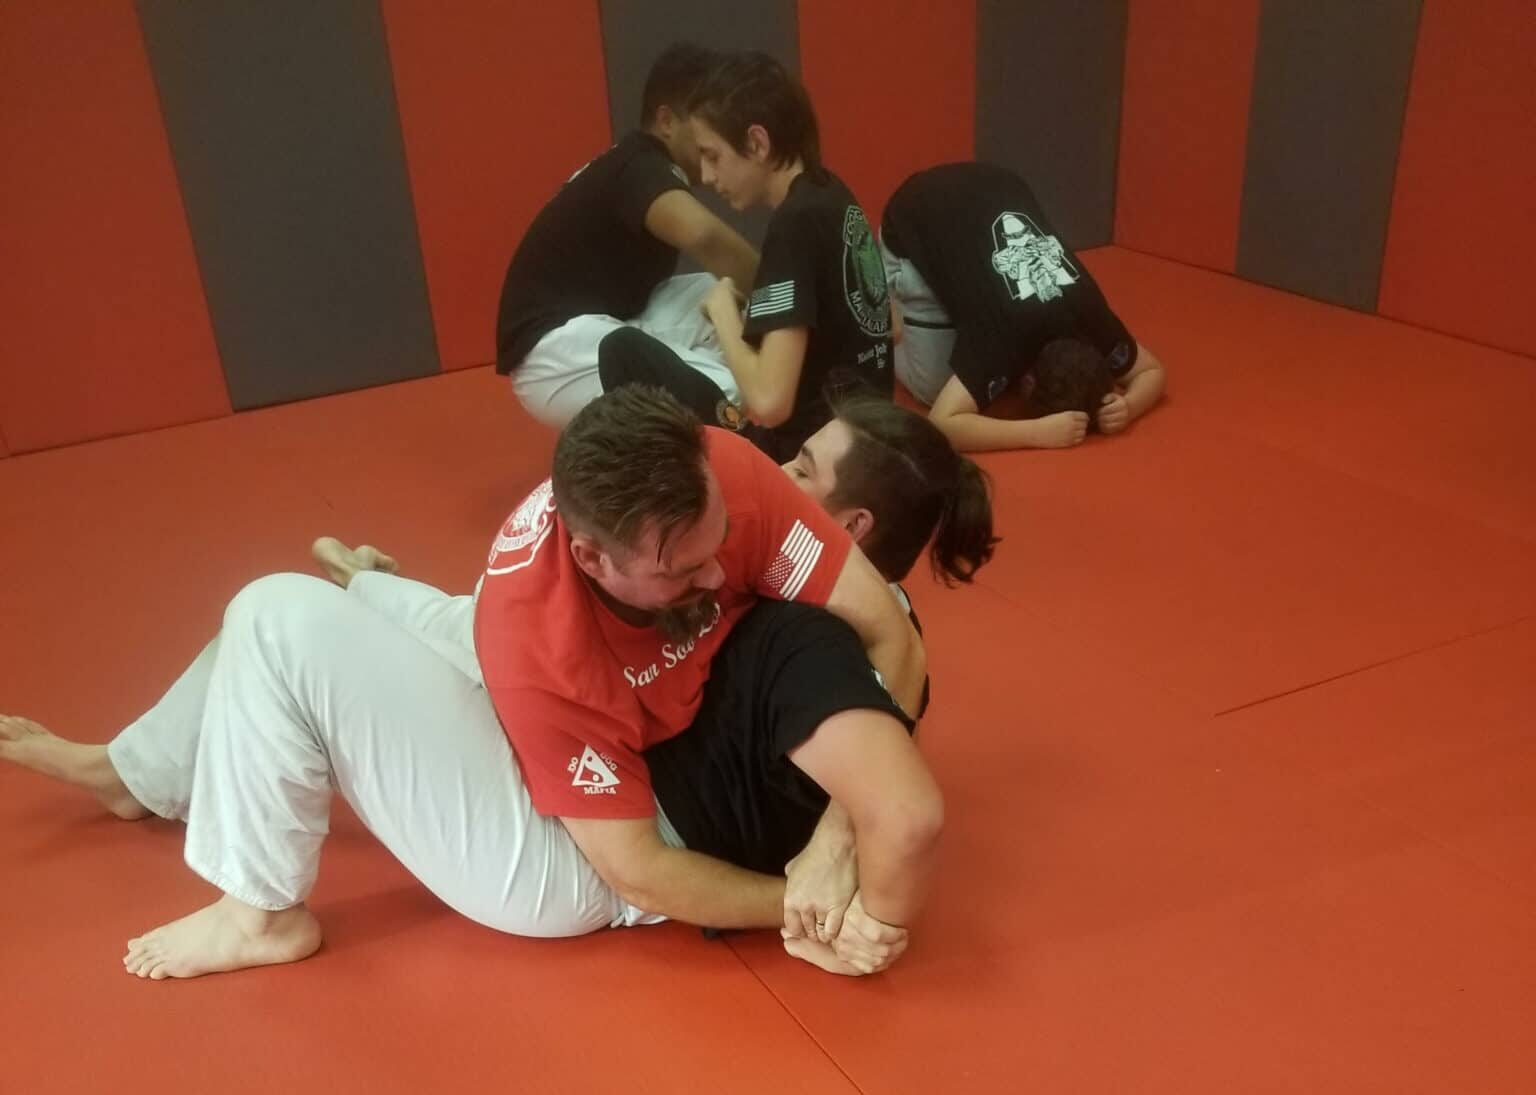 Foo Dogs Martial Arts Academy Foo Dogs' Adult Martial Arts Programs